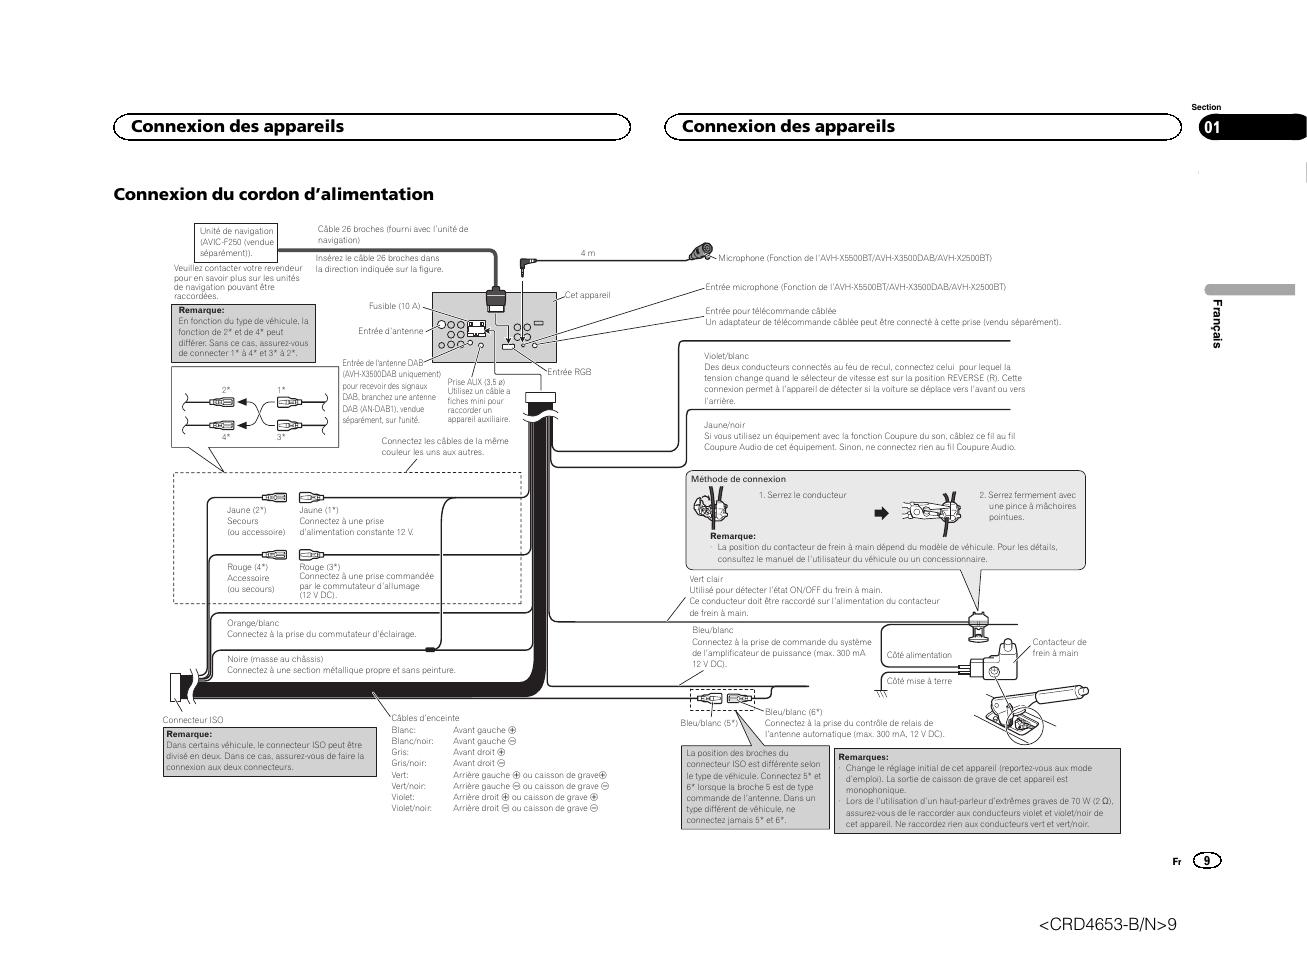 hight resolution of connexion du cordon d alimentation connexion des appareils pioneer avh x1500dvd user